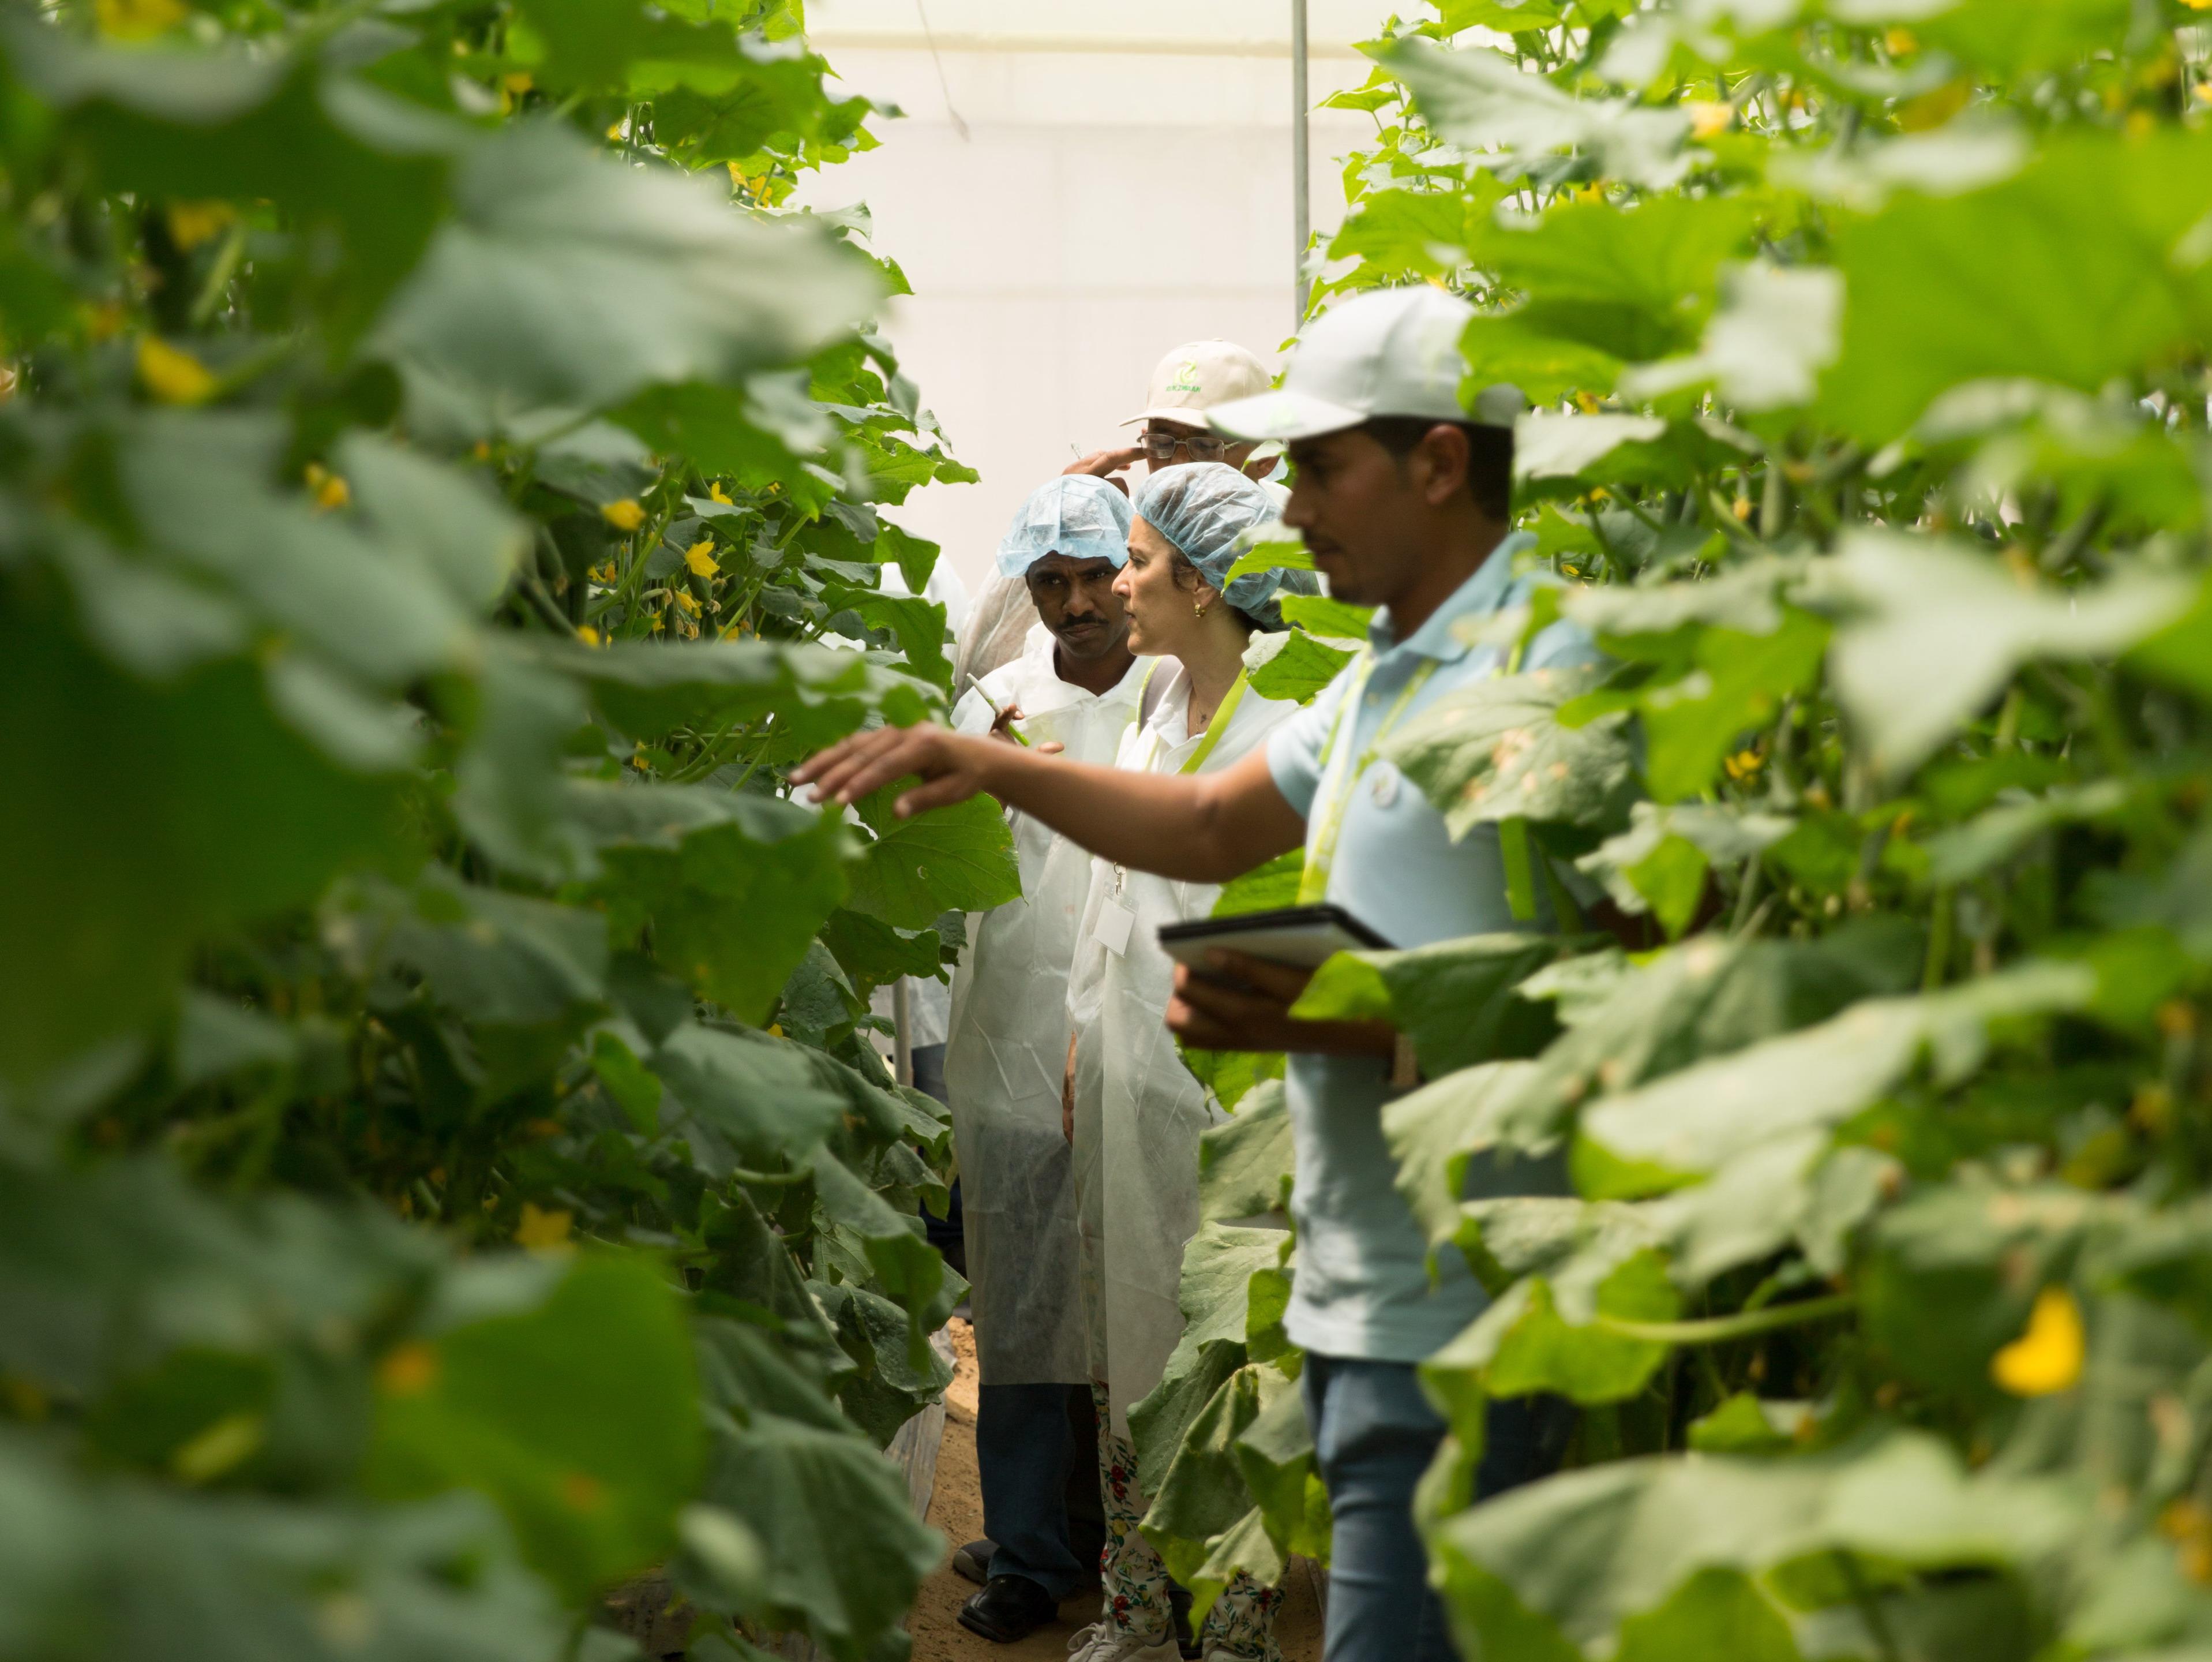 Growers and Rijk Zwaan advisors in cucumber greenhouse